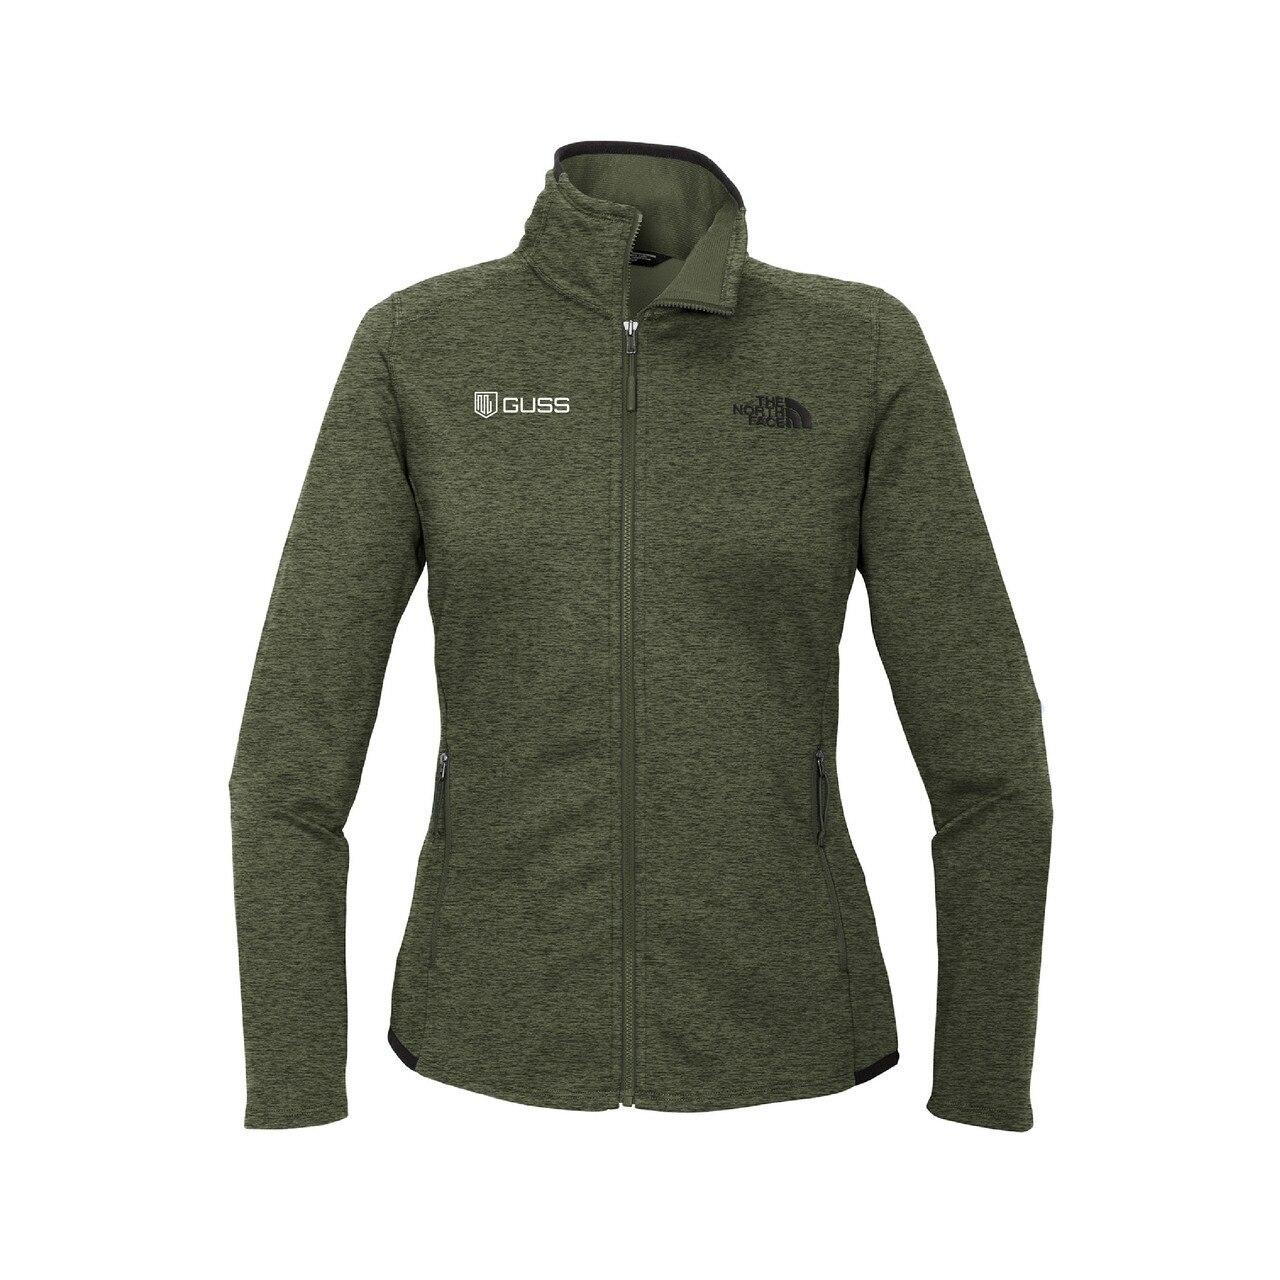 Women's - North Face Skyline Full-Zip Fleece Jacket - Four Leaf Clover